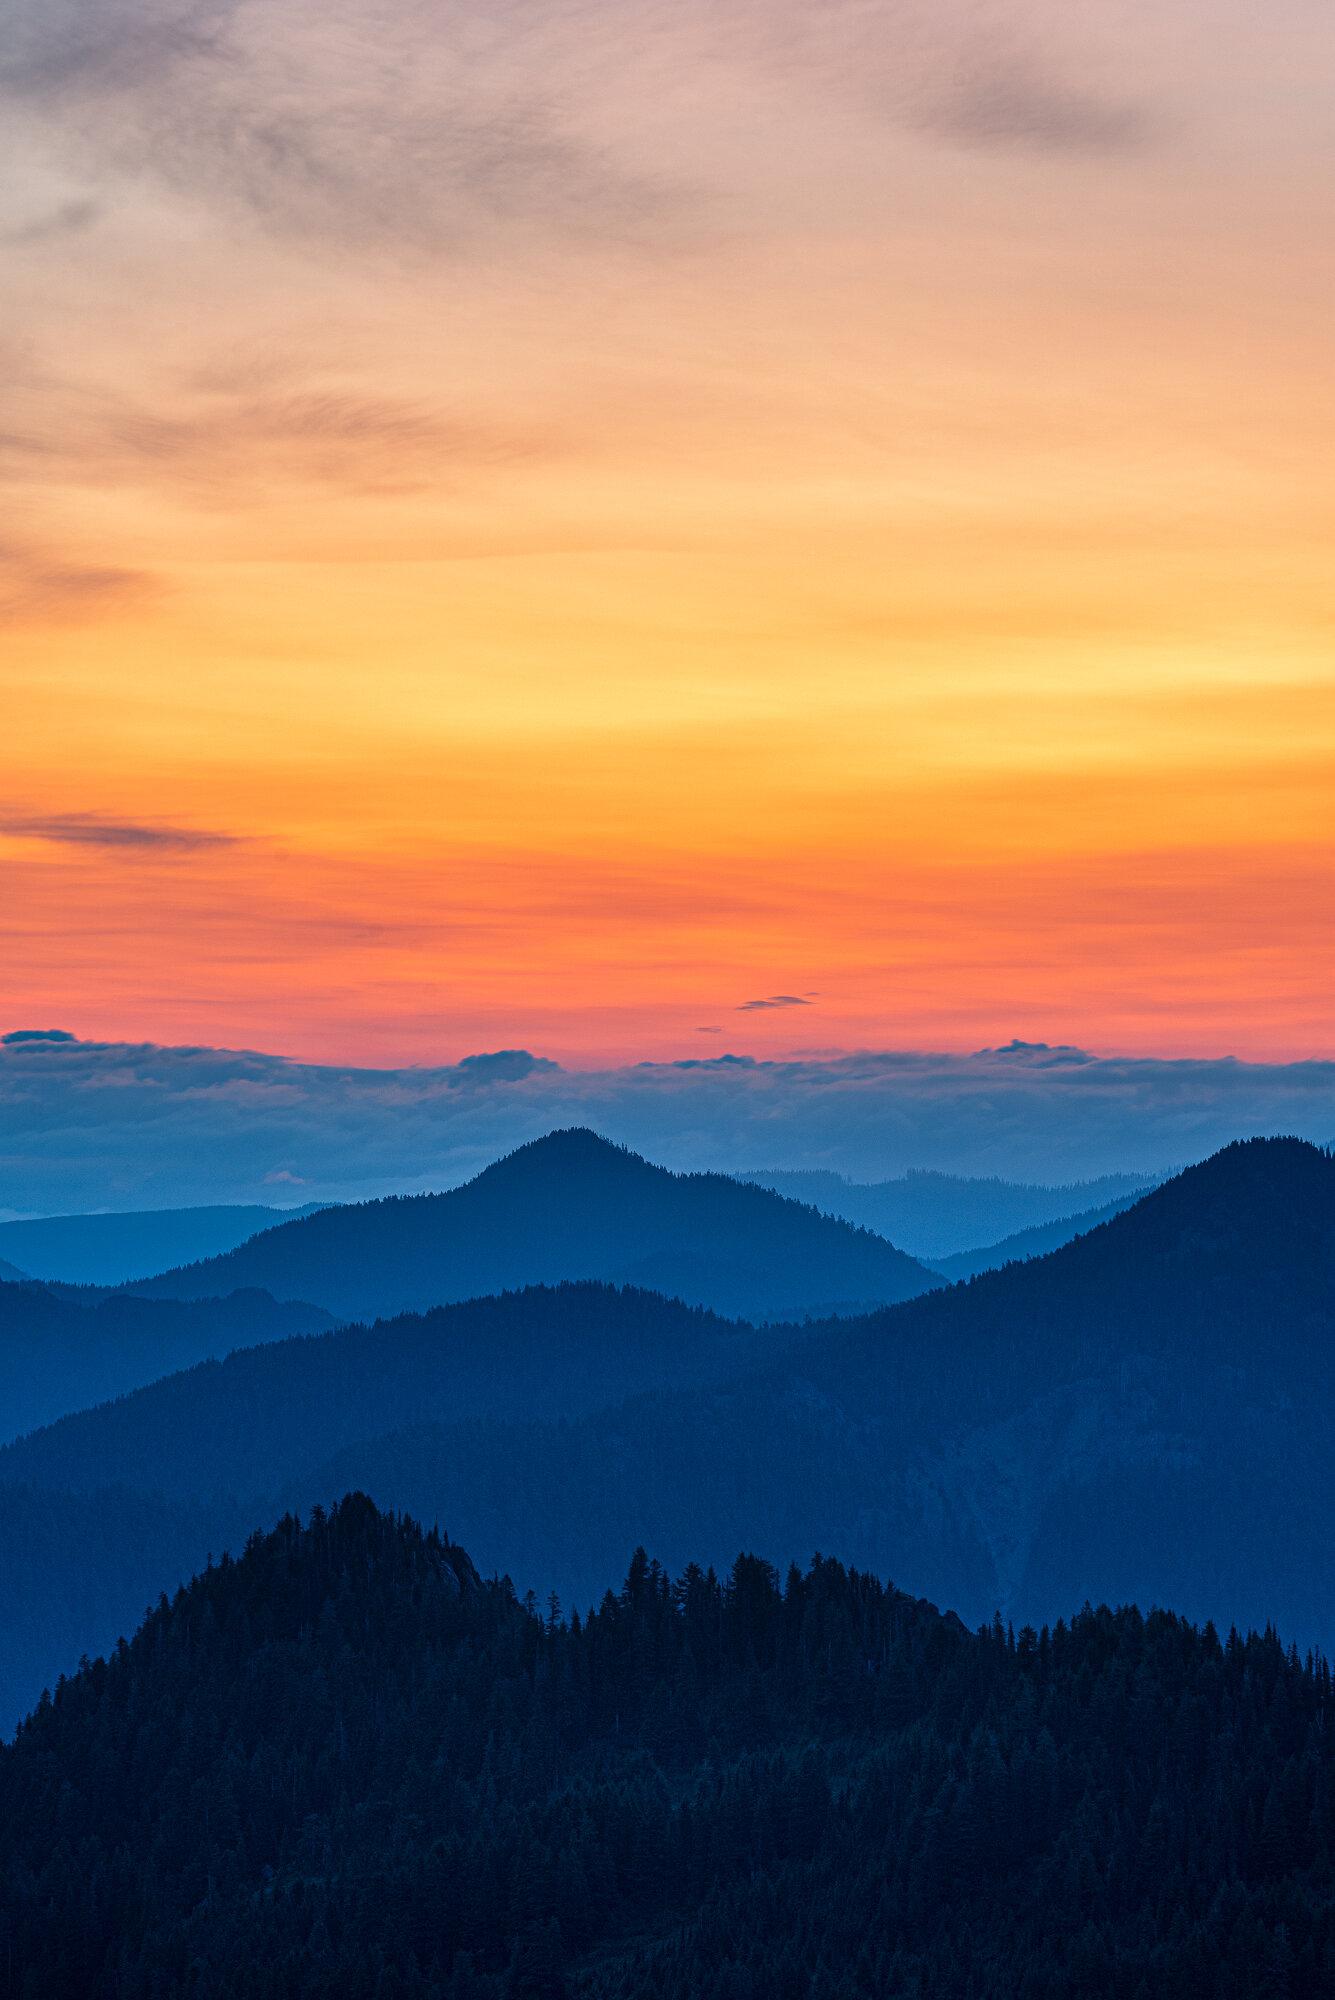 Mount Rainier Photography: 'Layers at Sunrise'